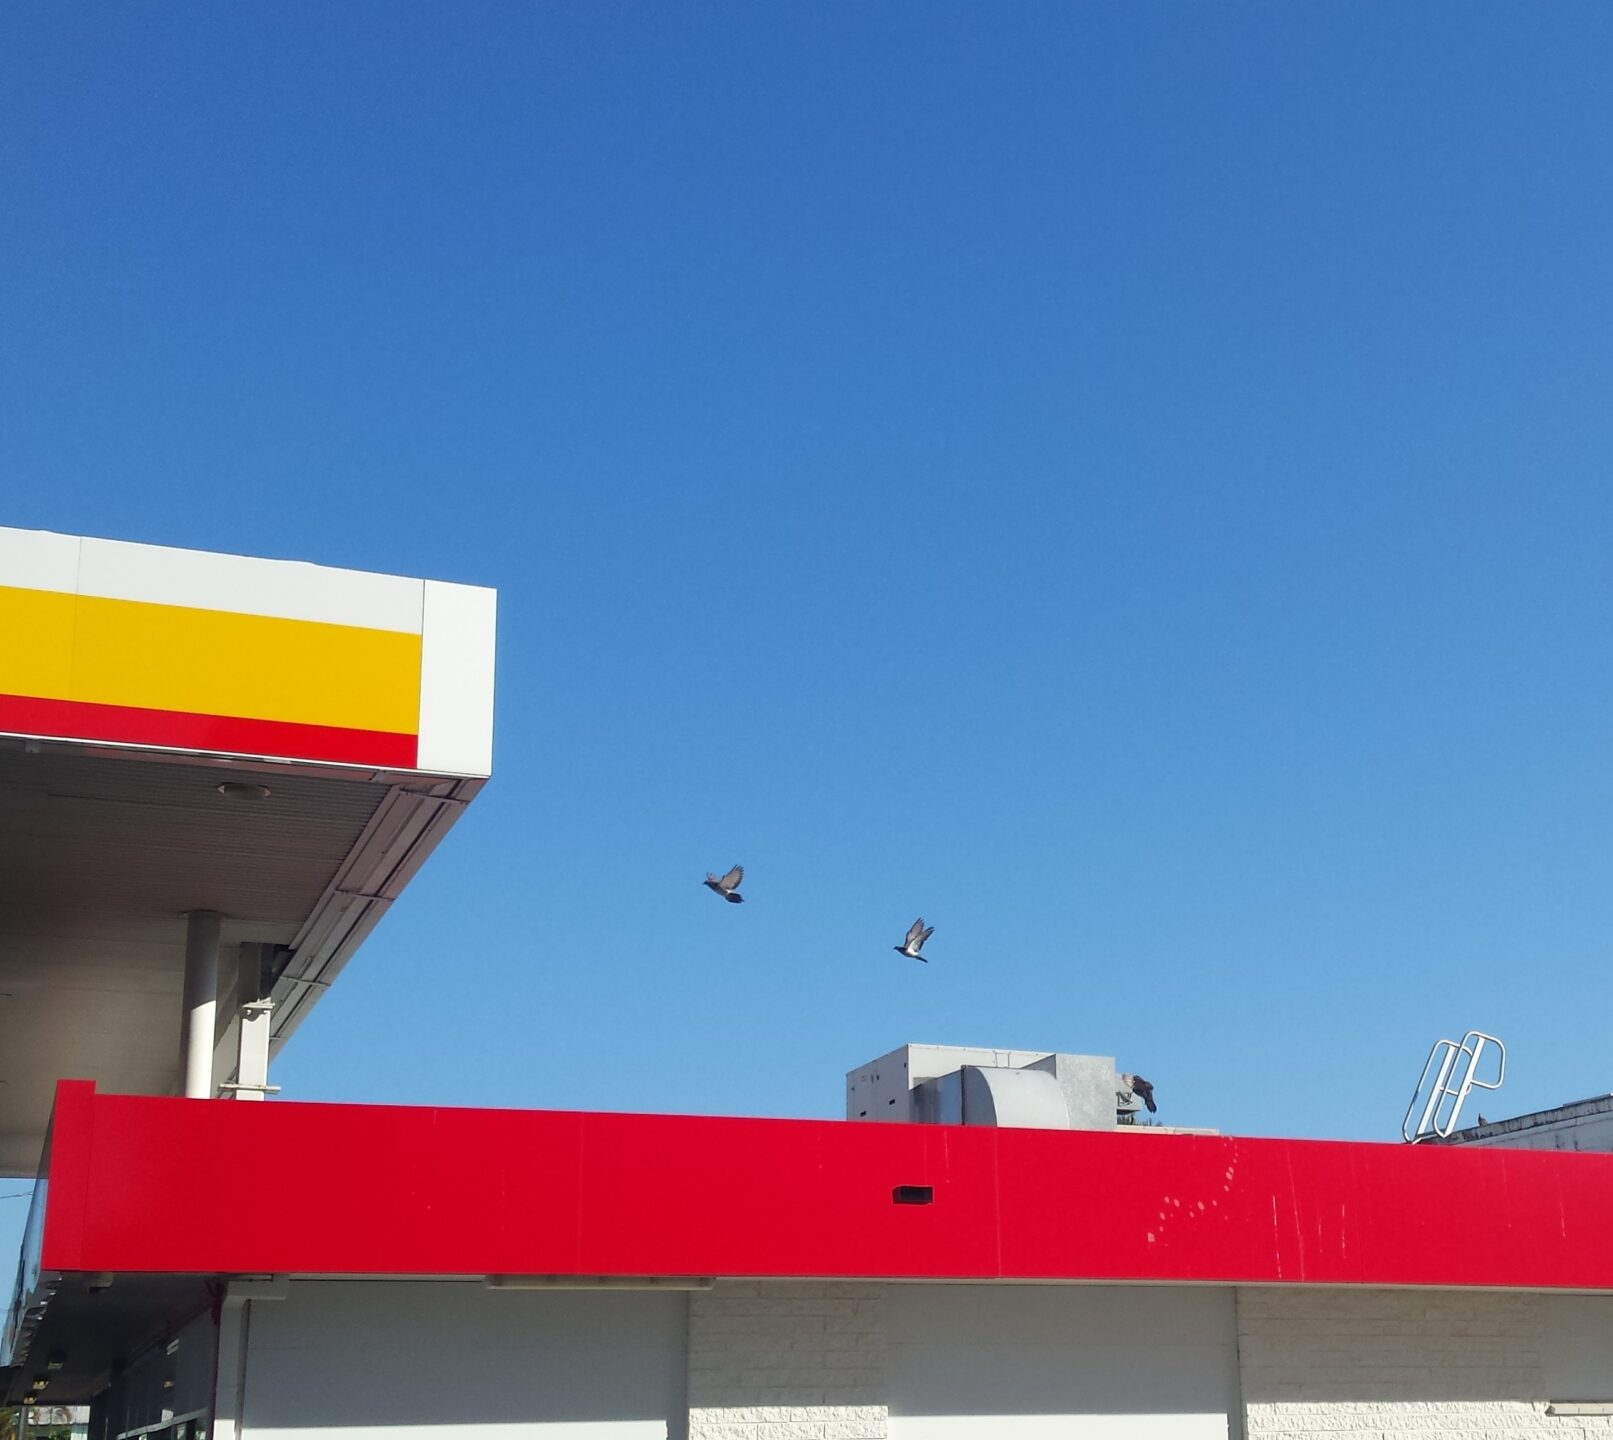 Blue sky, building rooflines, two birds flying.